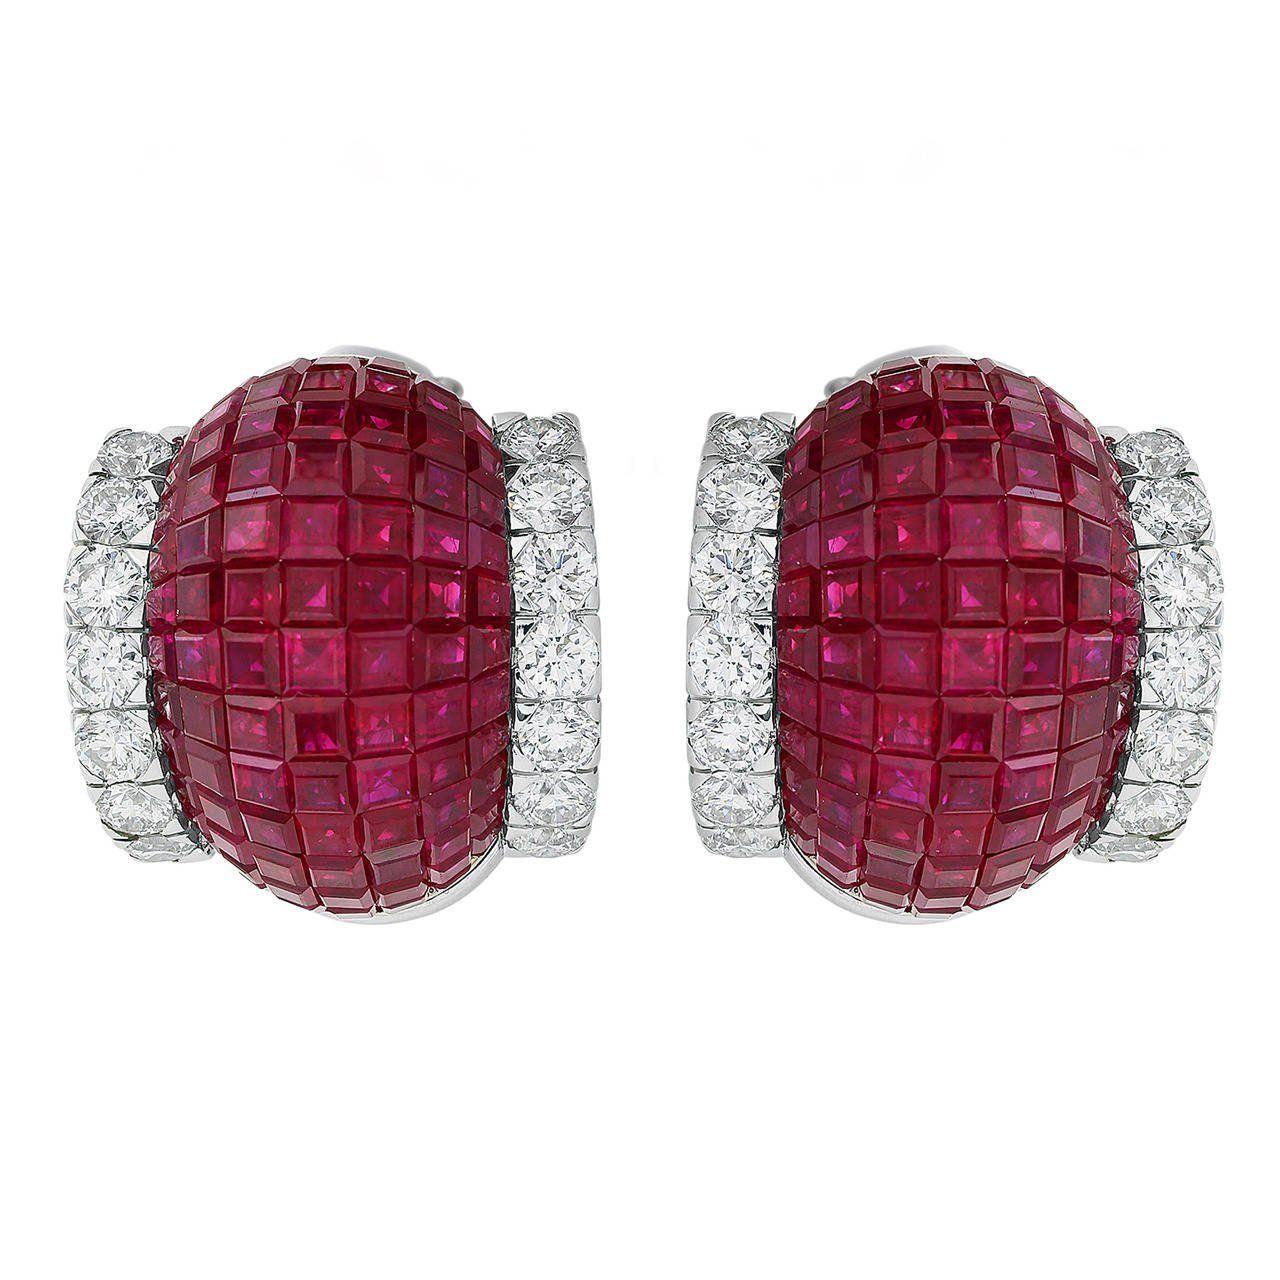 abf24a12e Invisible Setting Ruby Diamond Earrings | Ruby jewelry | Diamond ...